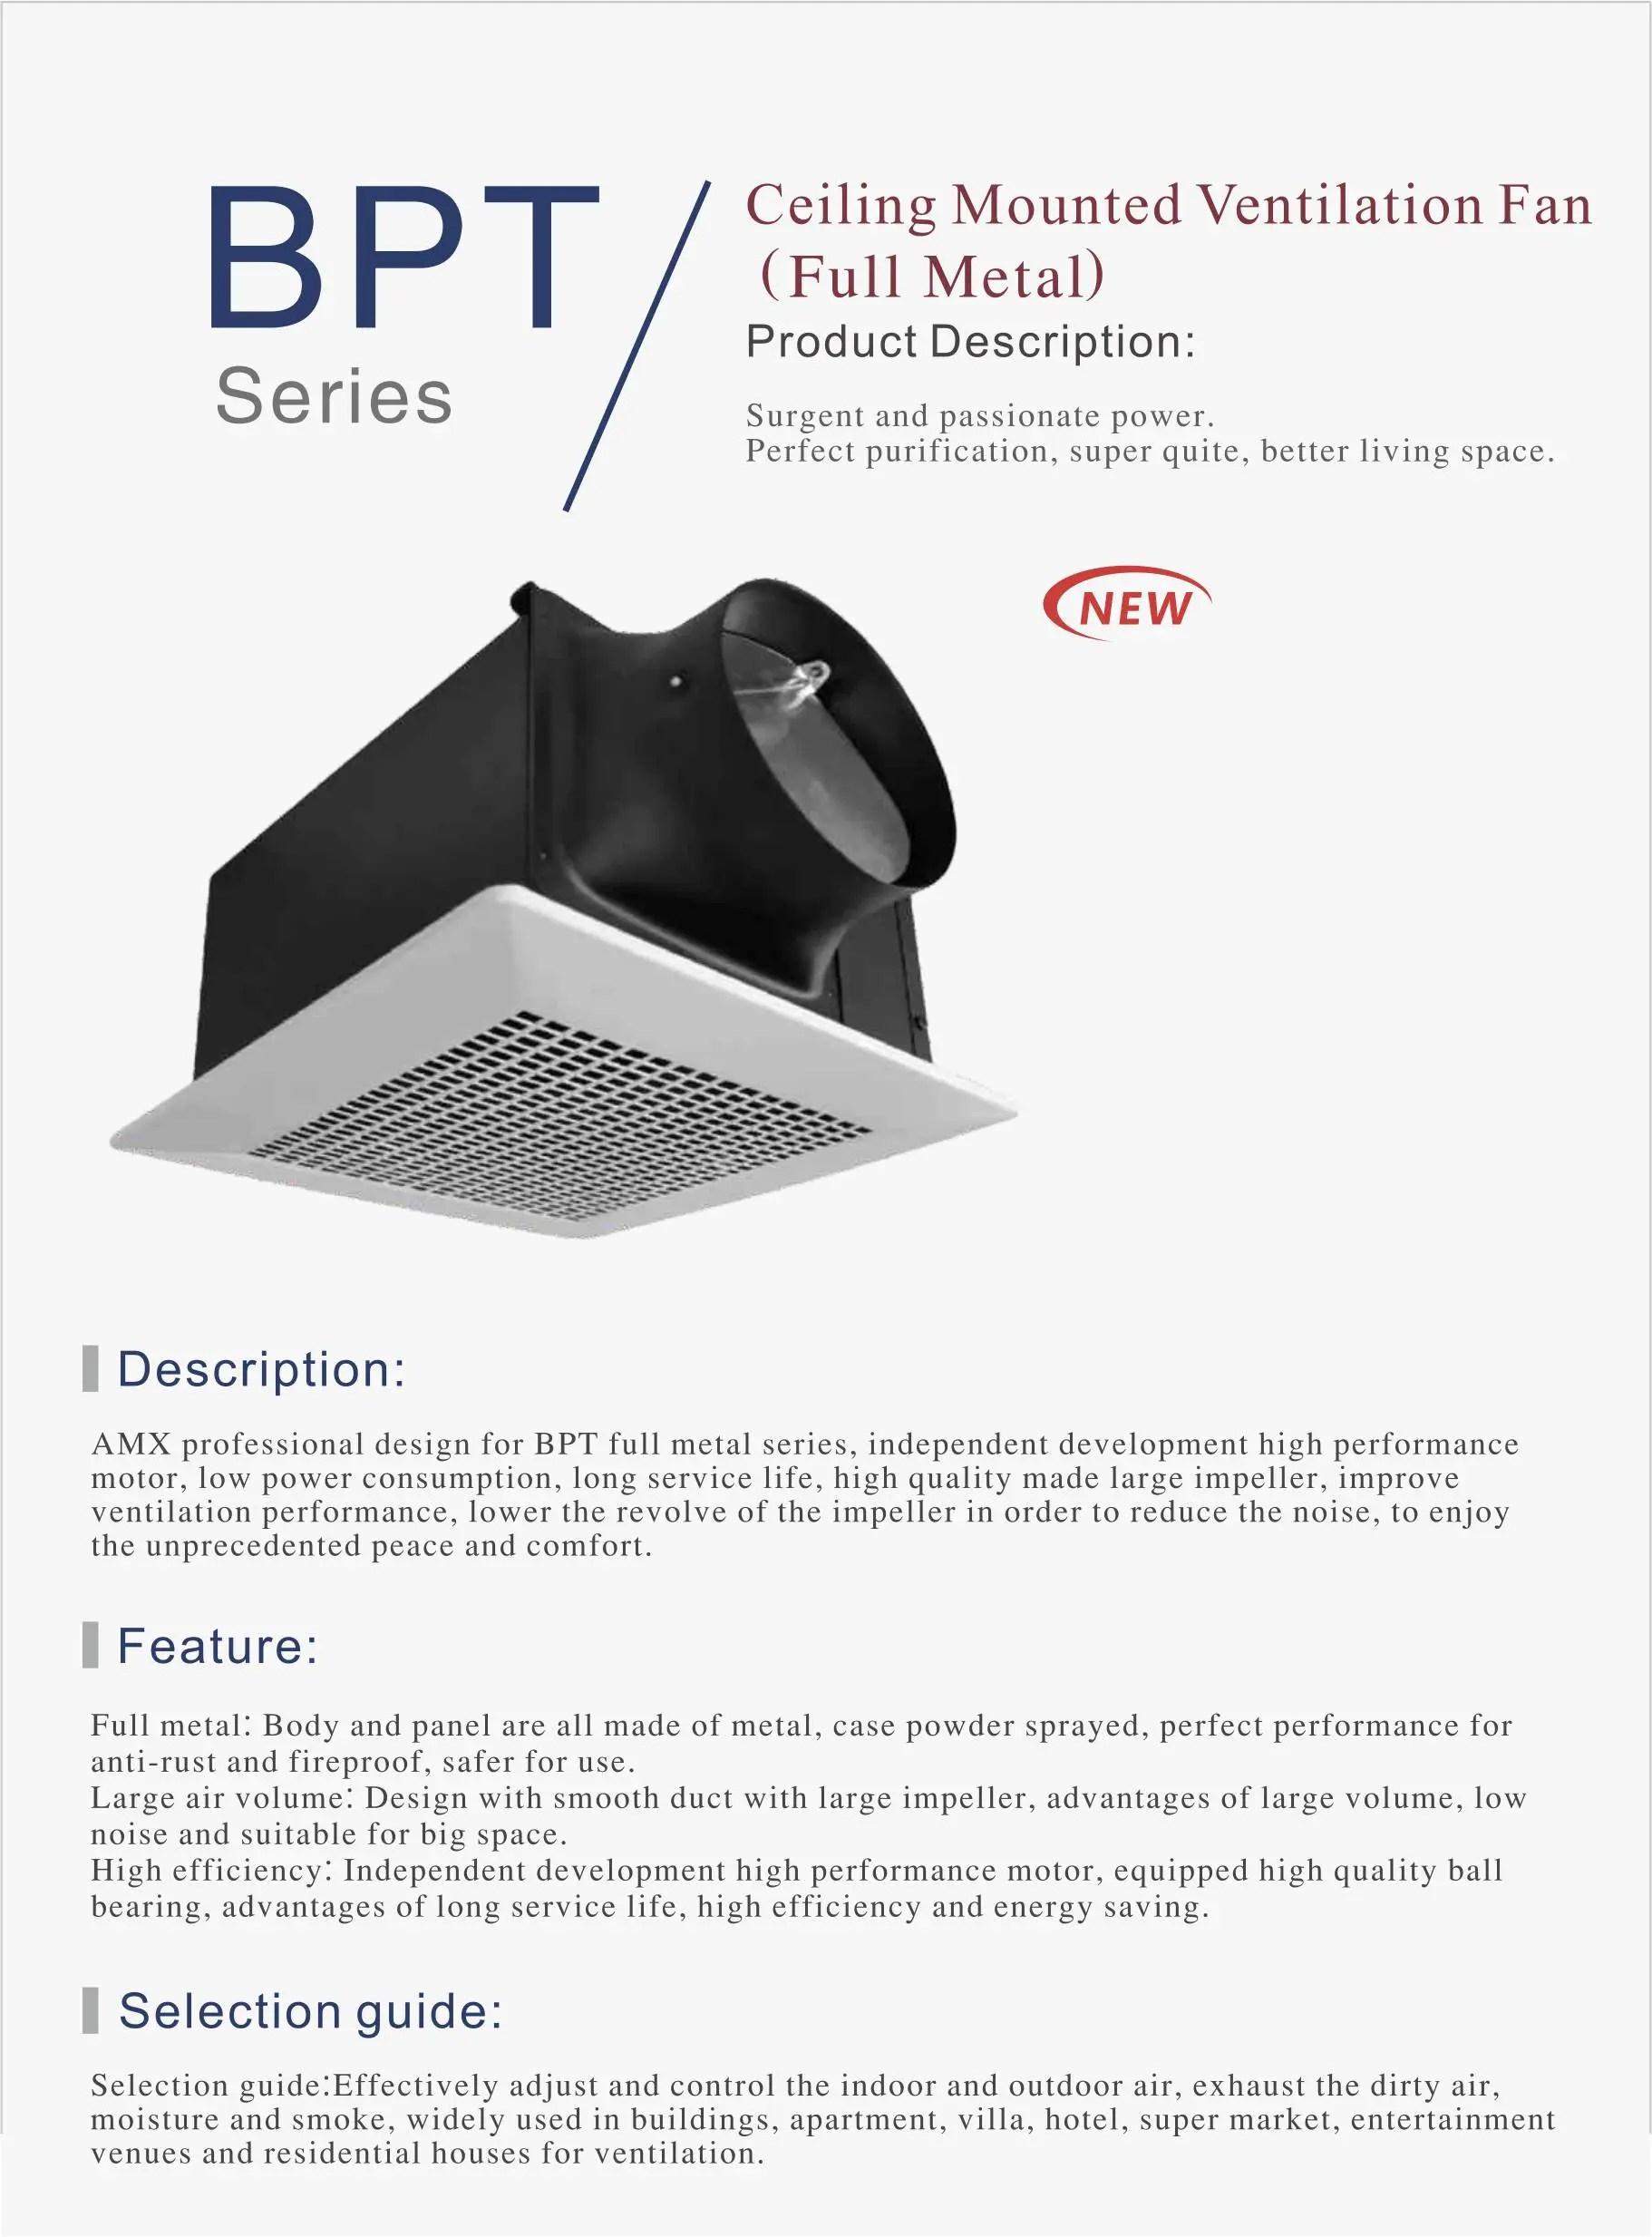 bpt series full metal ventilation fan